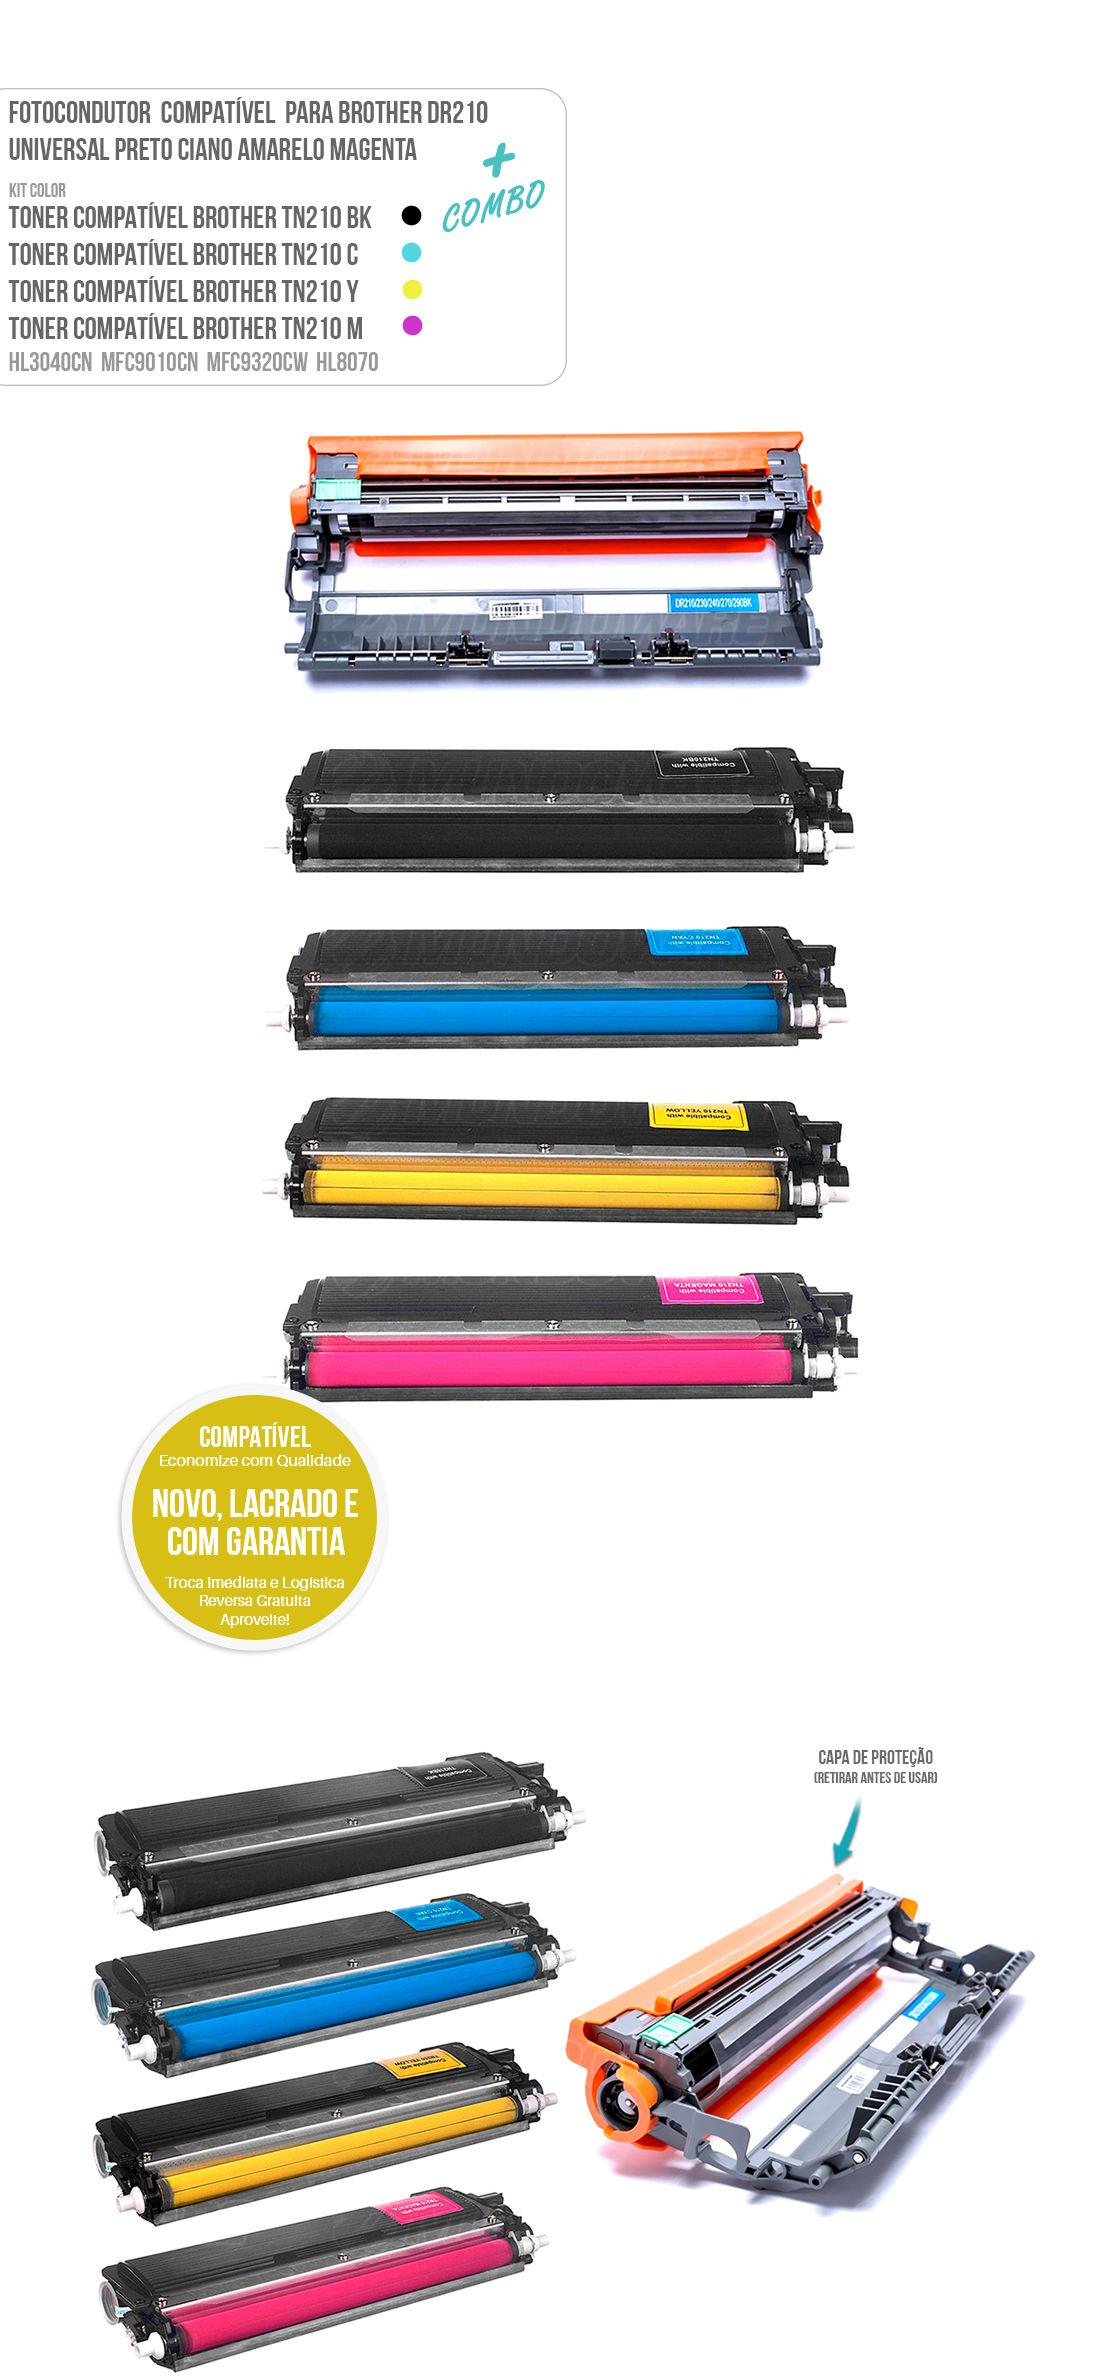 Kit colorido TN-210 TN210 Tonner e Fotocondutor para impressoras HL-3040CN HL-3070CW MFC-9120CN MFC-9320CW MFC-9325CW HL3040 HL3070 MFC9120 MFC9320 MFC9325